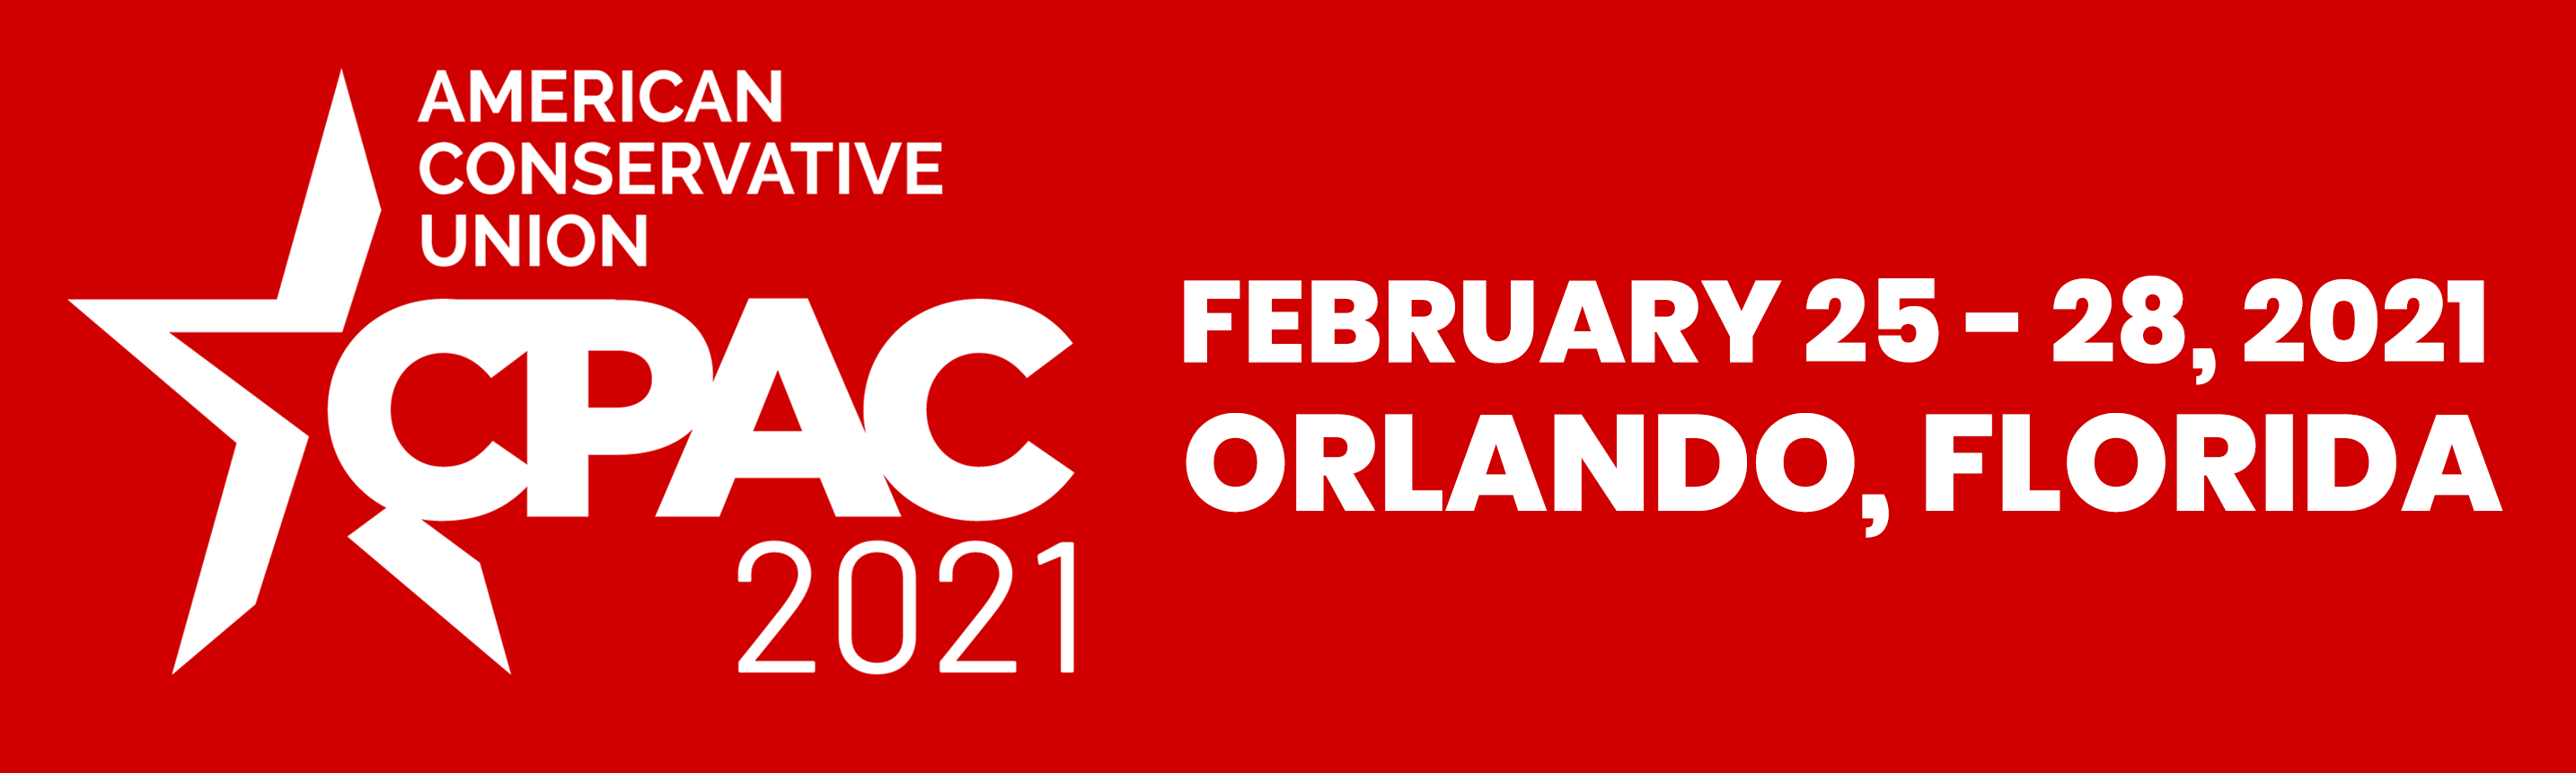 Register for CPAC 2021 in Orlando, Florida